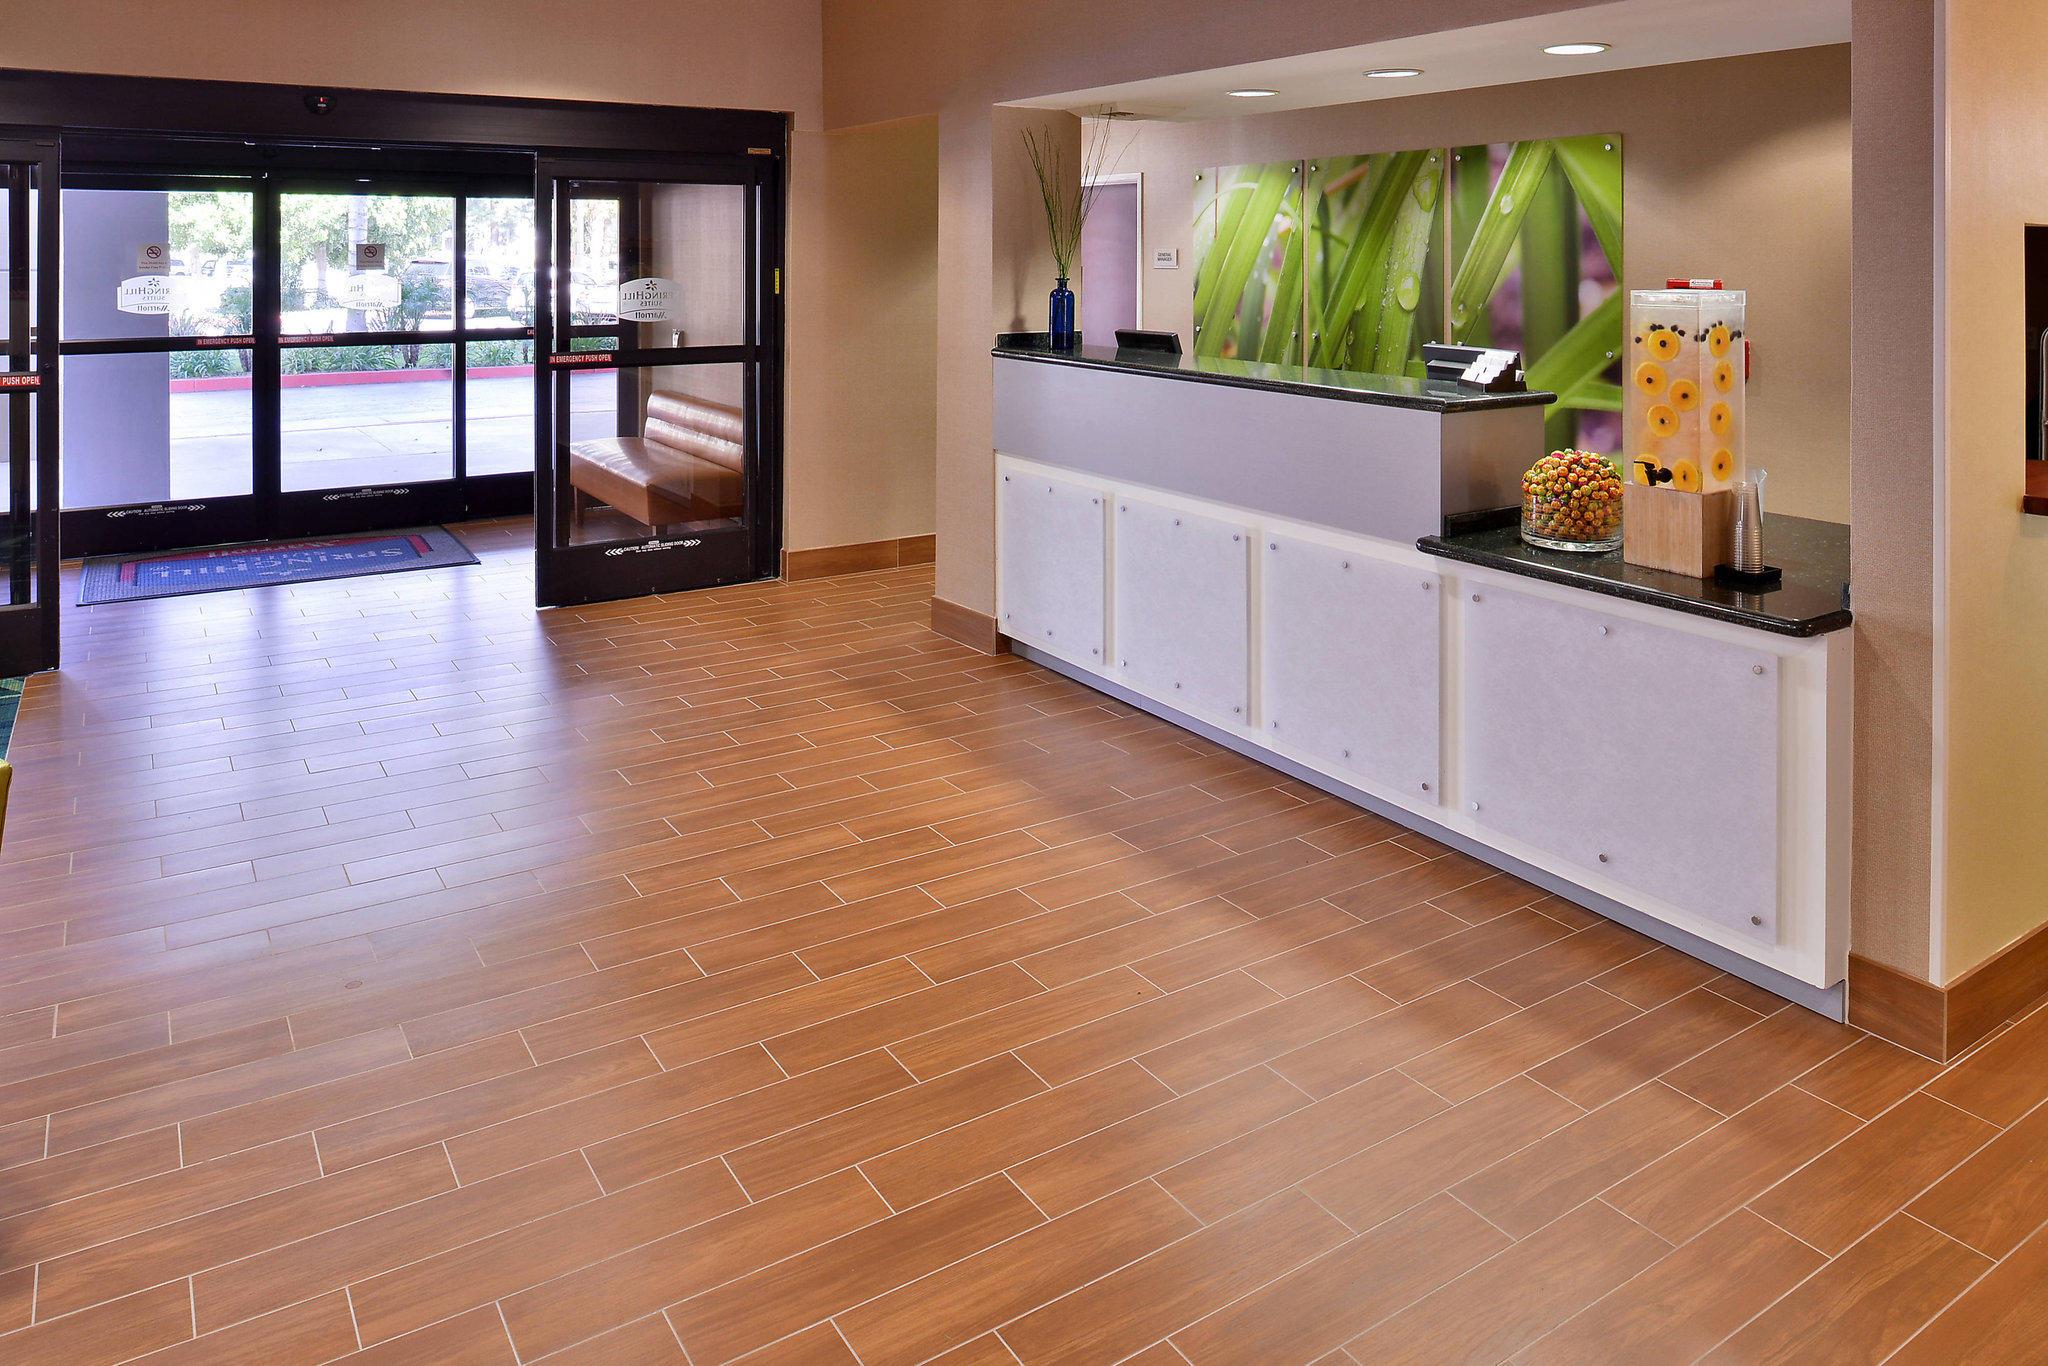 SpringHill Suites by Marriott Pasadena Arcadia